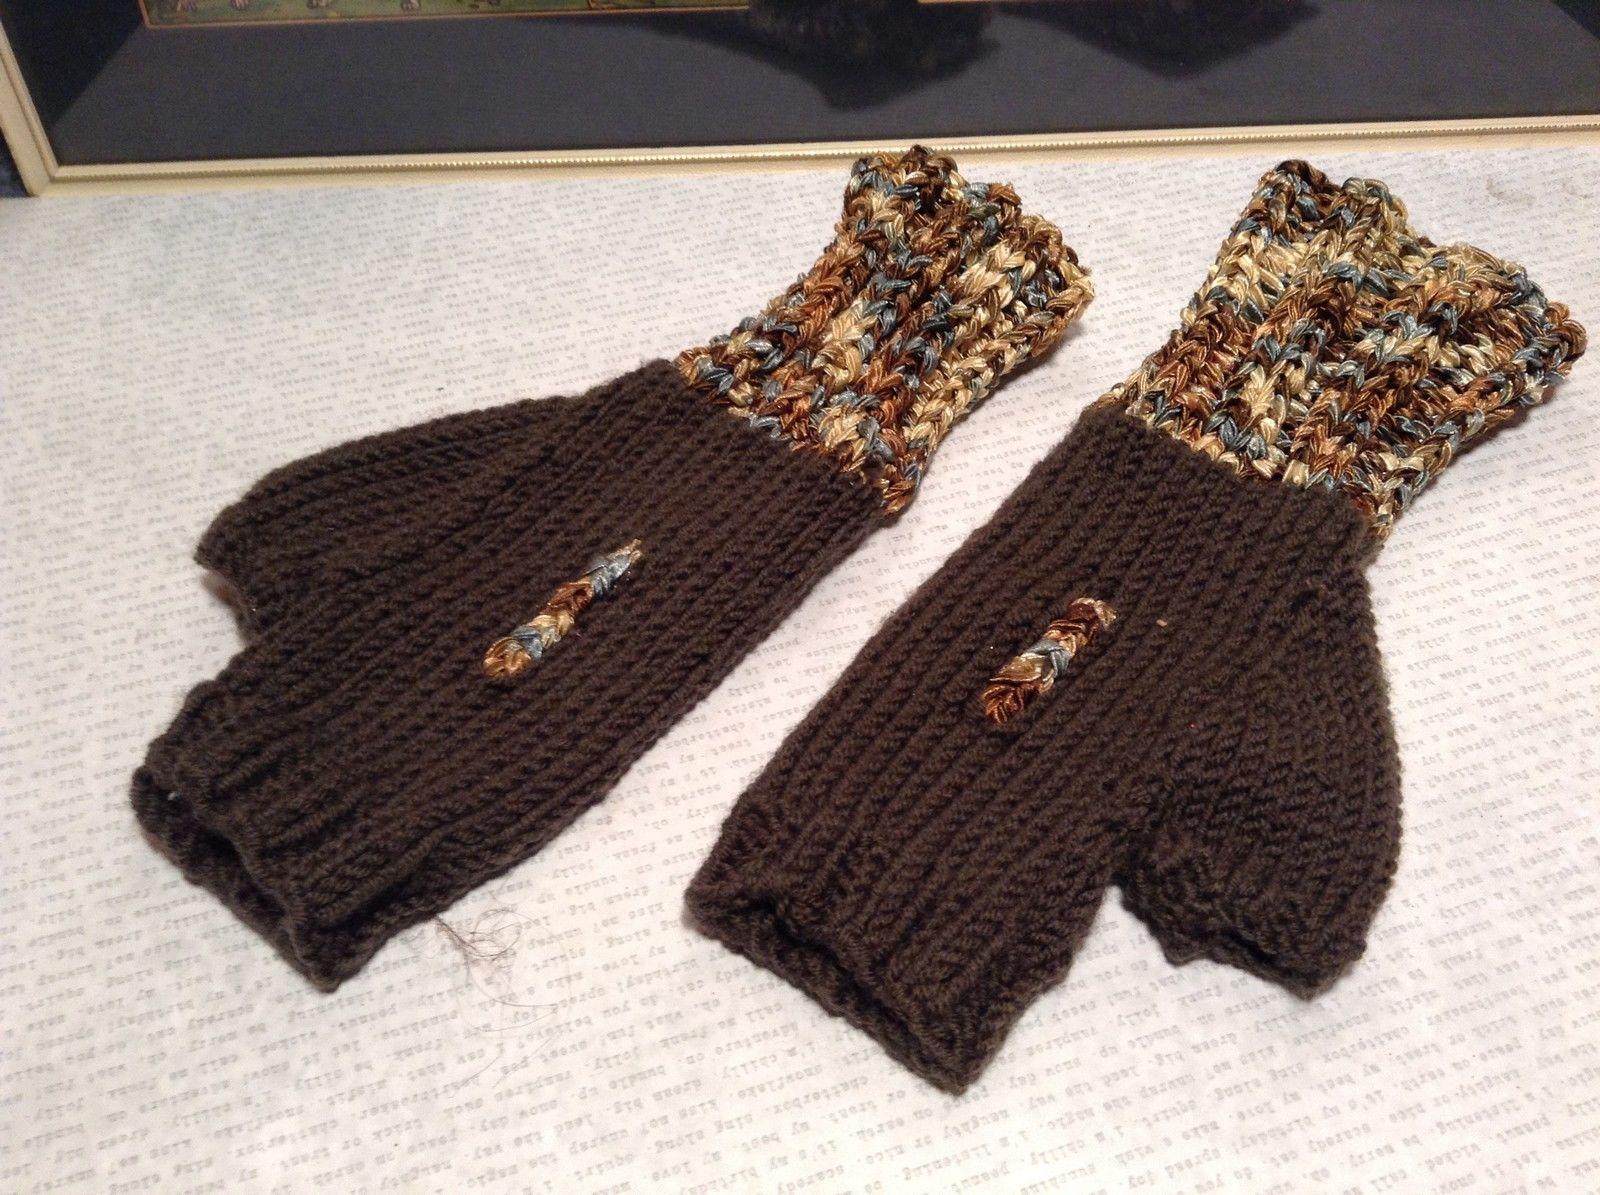 Dark Brown Hand Knitted Woven Fingerless Gloves Very Soft